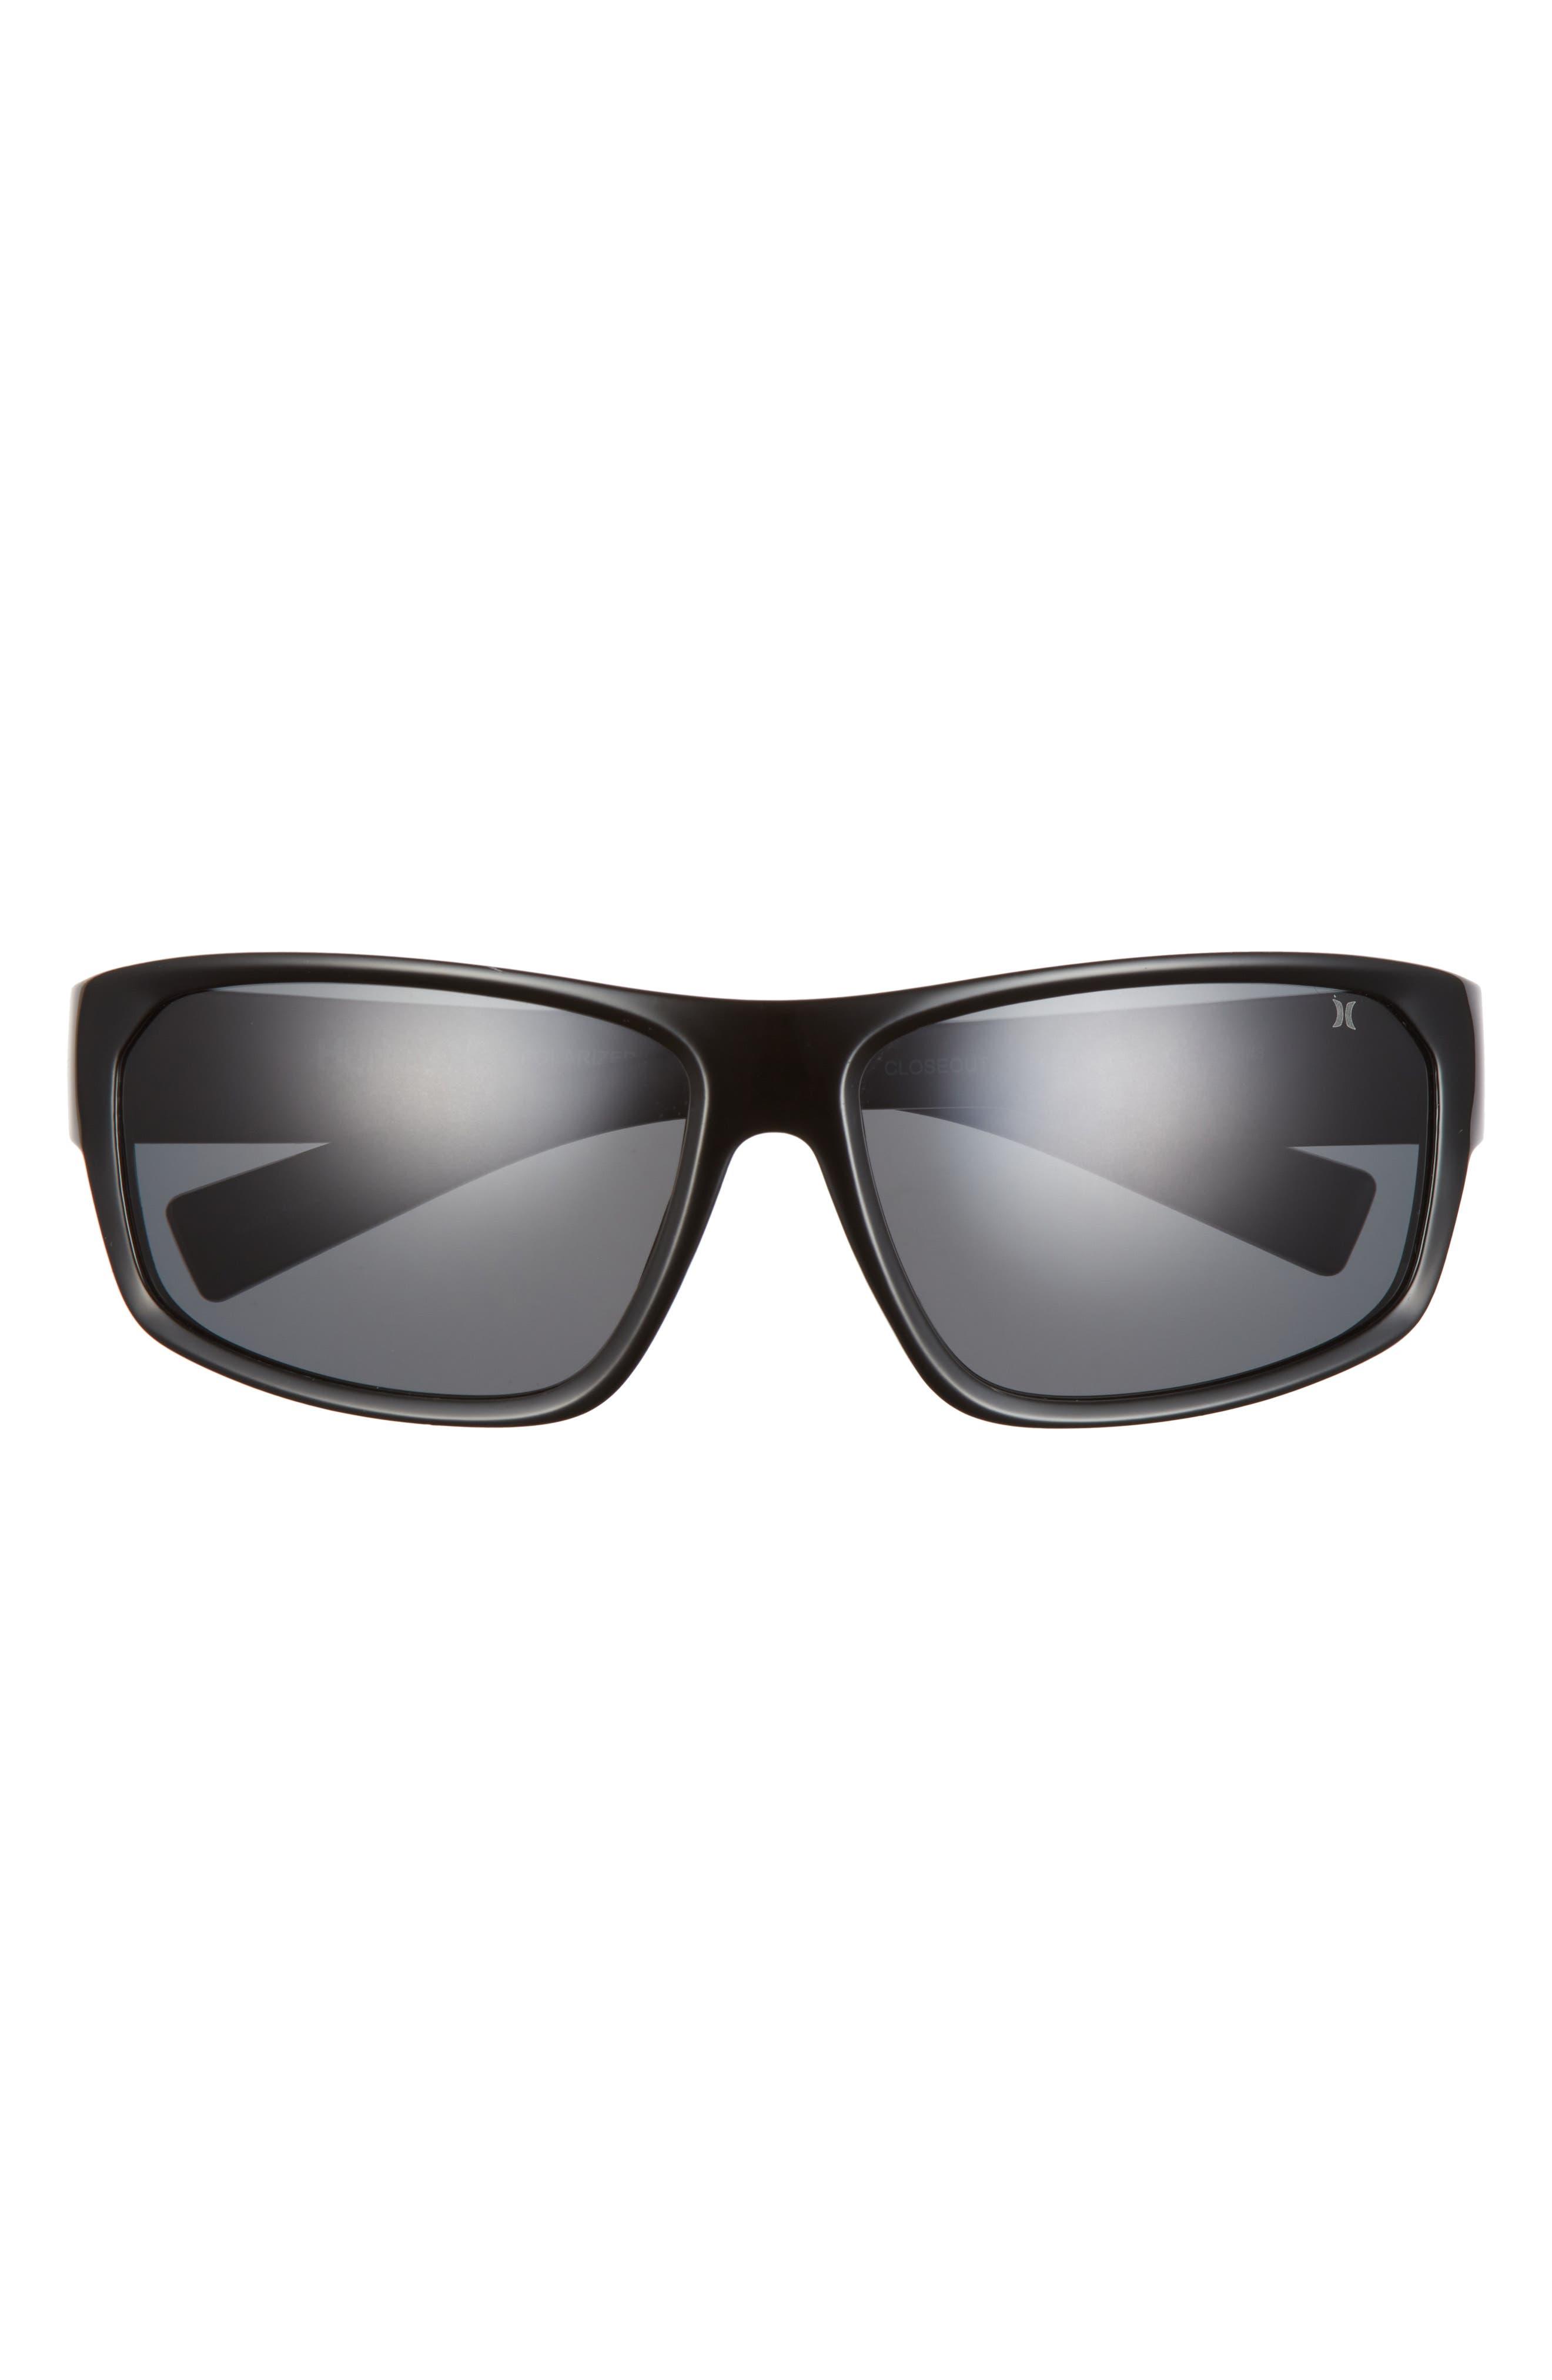 Closeout 64mm Polarized Oversize Wrap Sunglasses